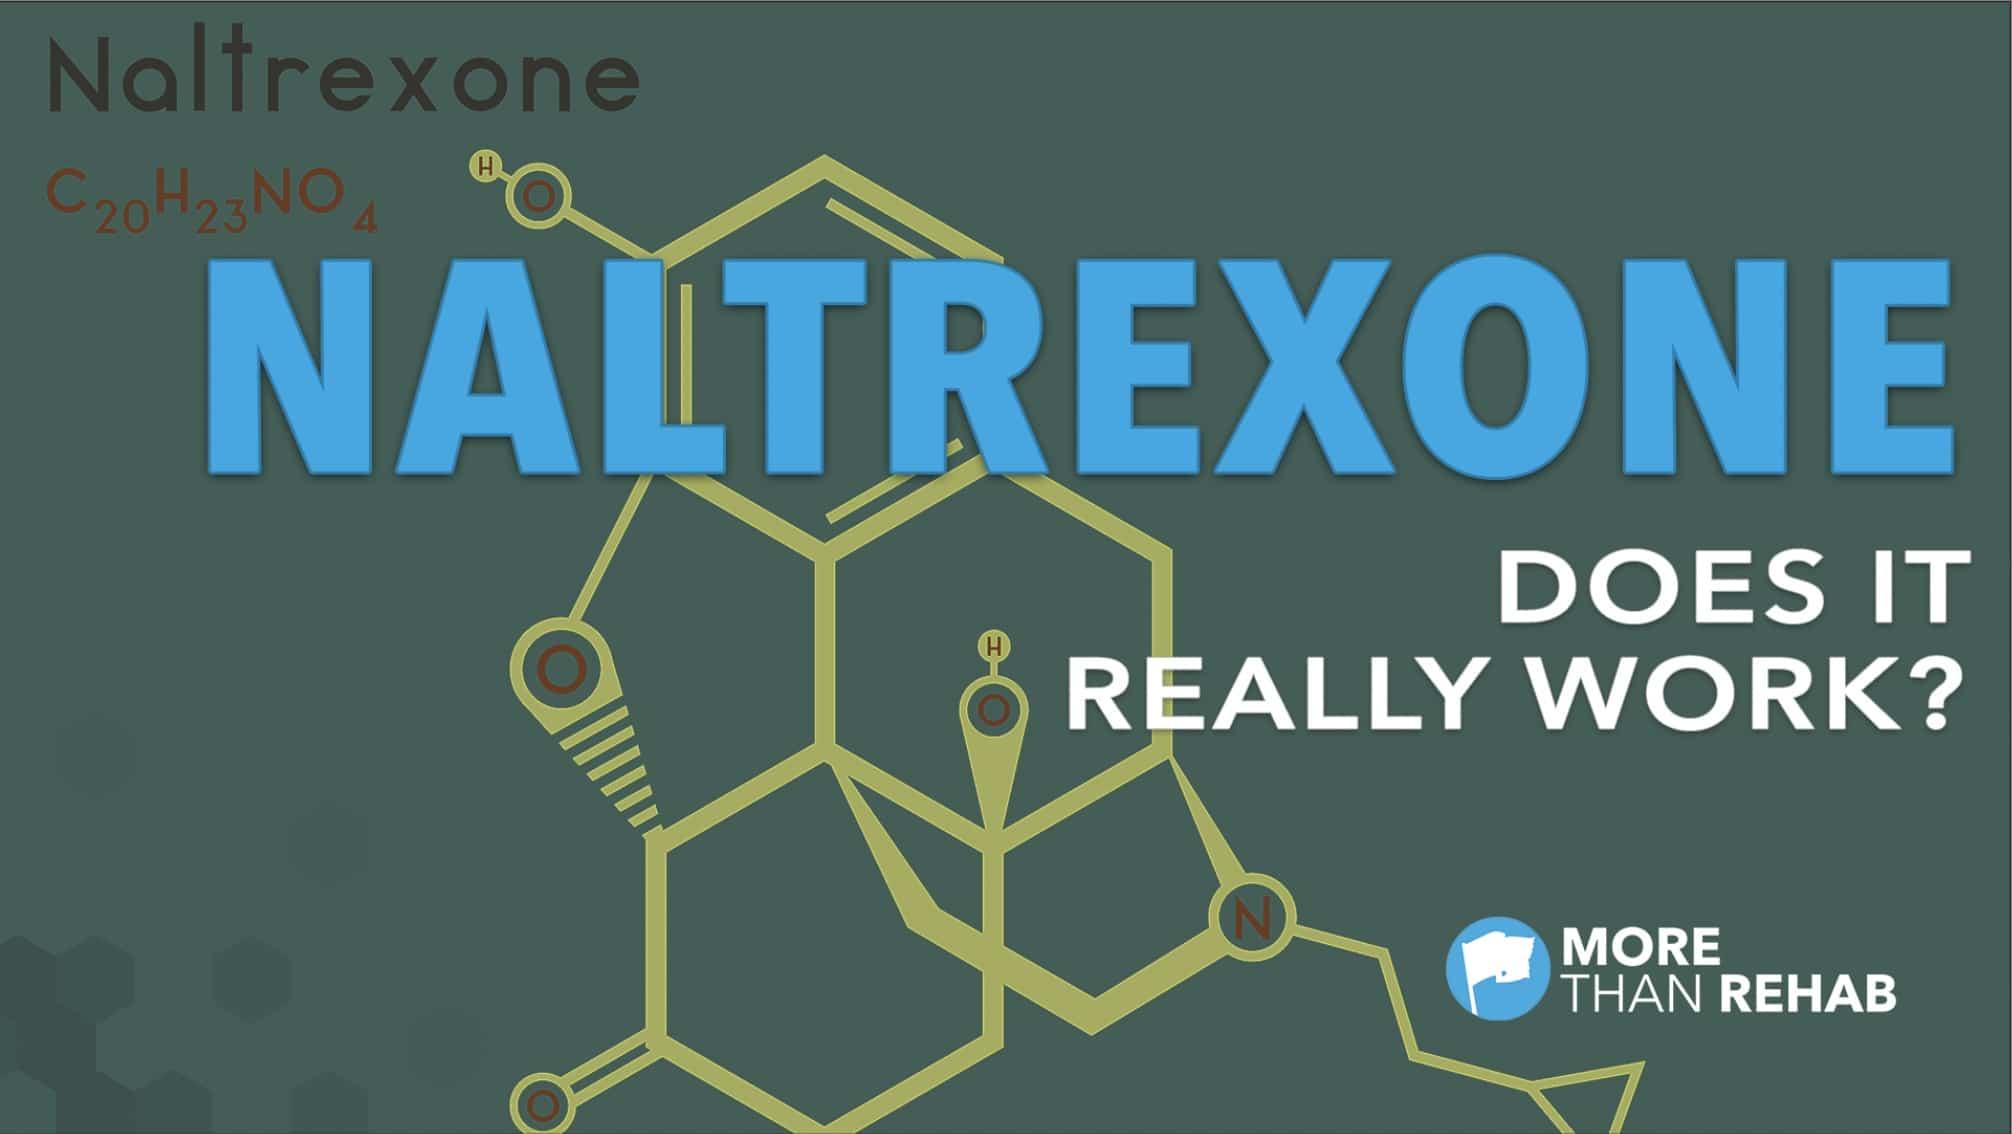 drug-implants-like-naltrexone-really-work-cure-addiction-treatment-Houston-Texas